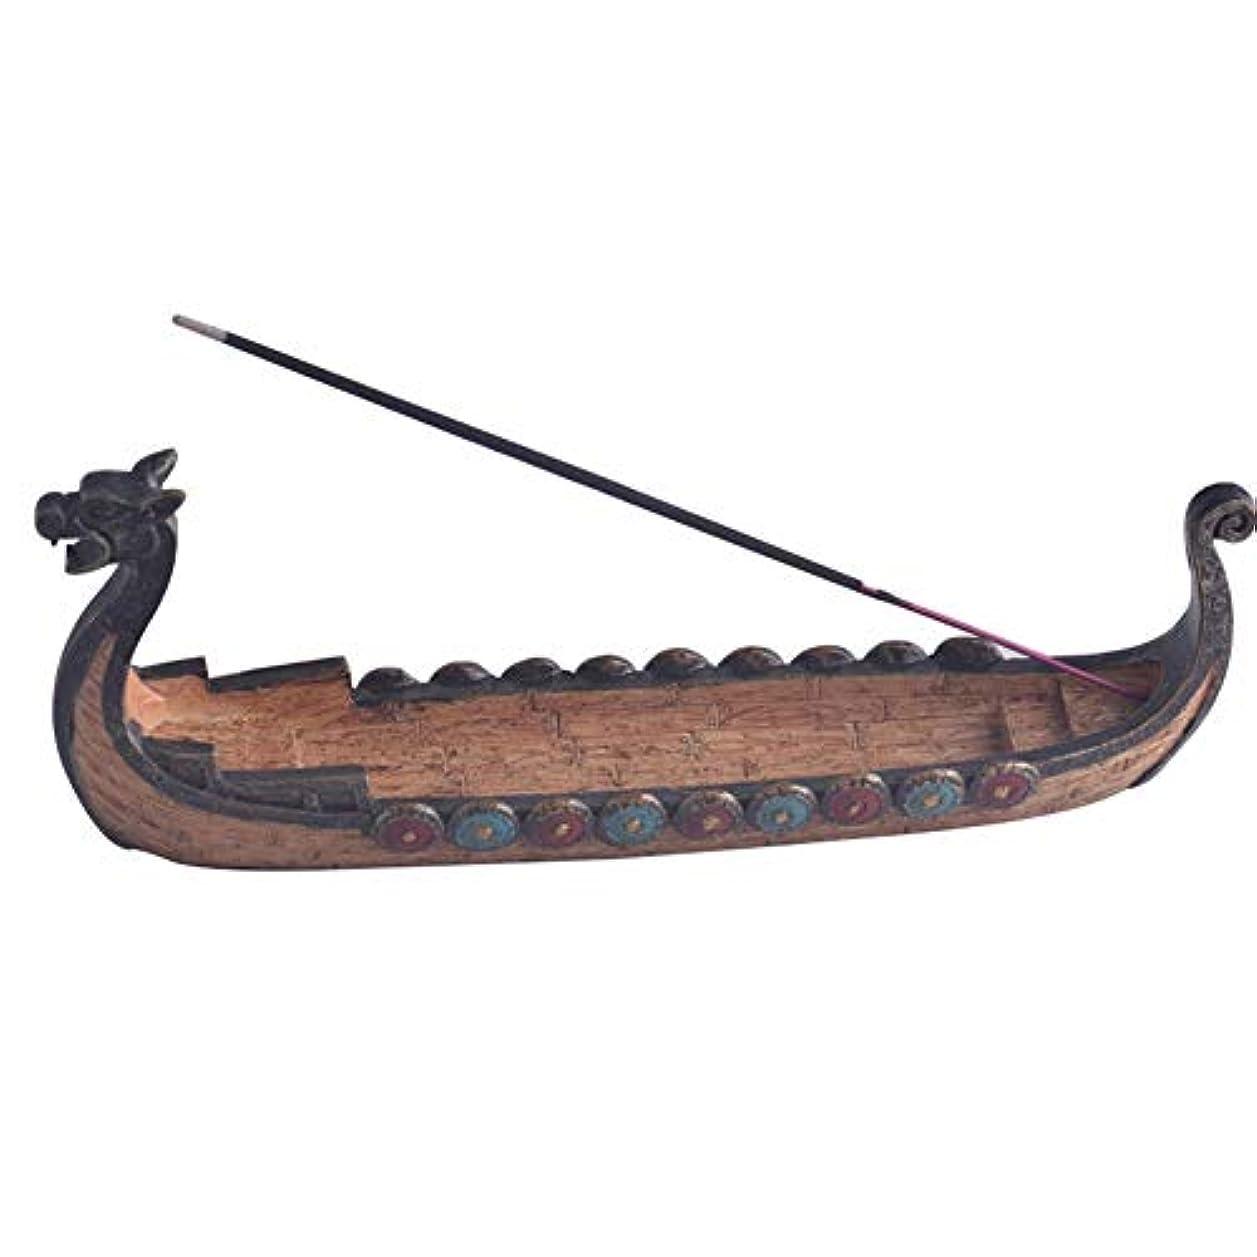 CoolTack スティック香中国の伝統的な家の装飾のためのドラゴンボート型香炉